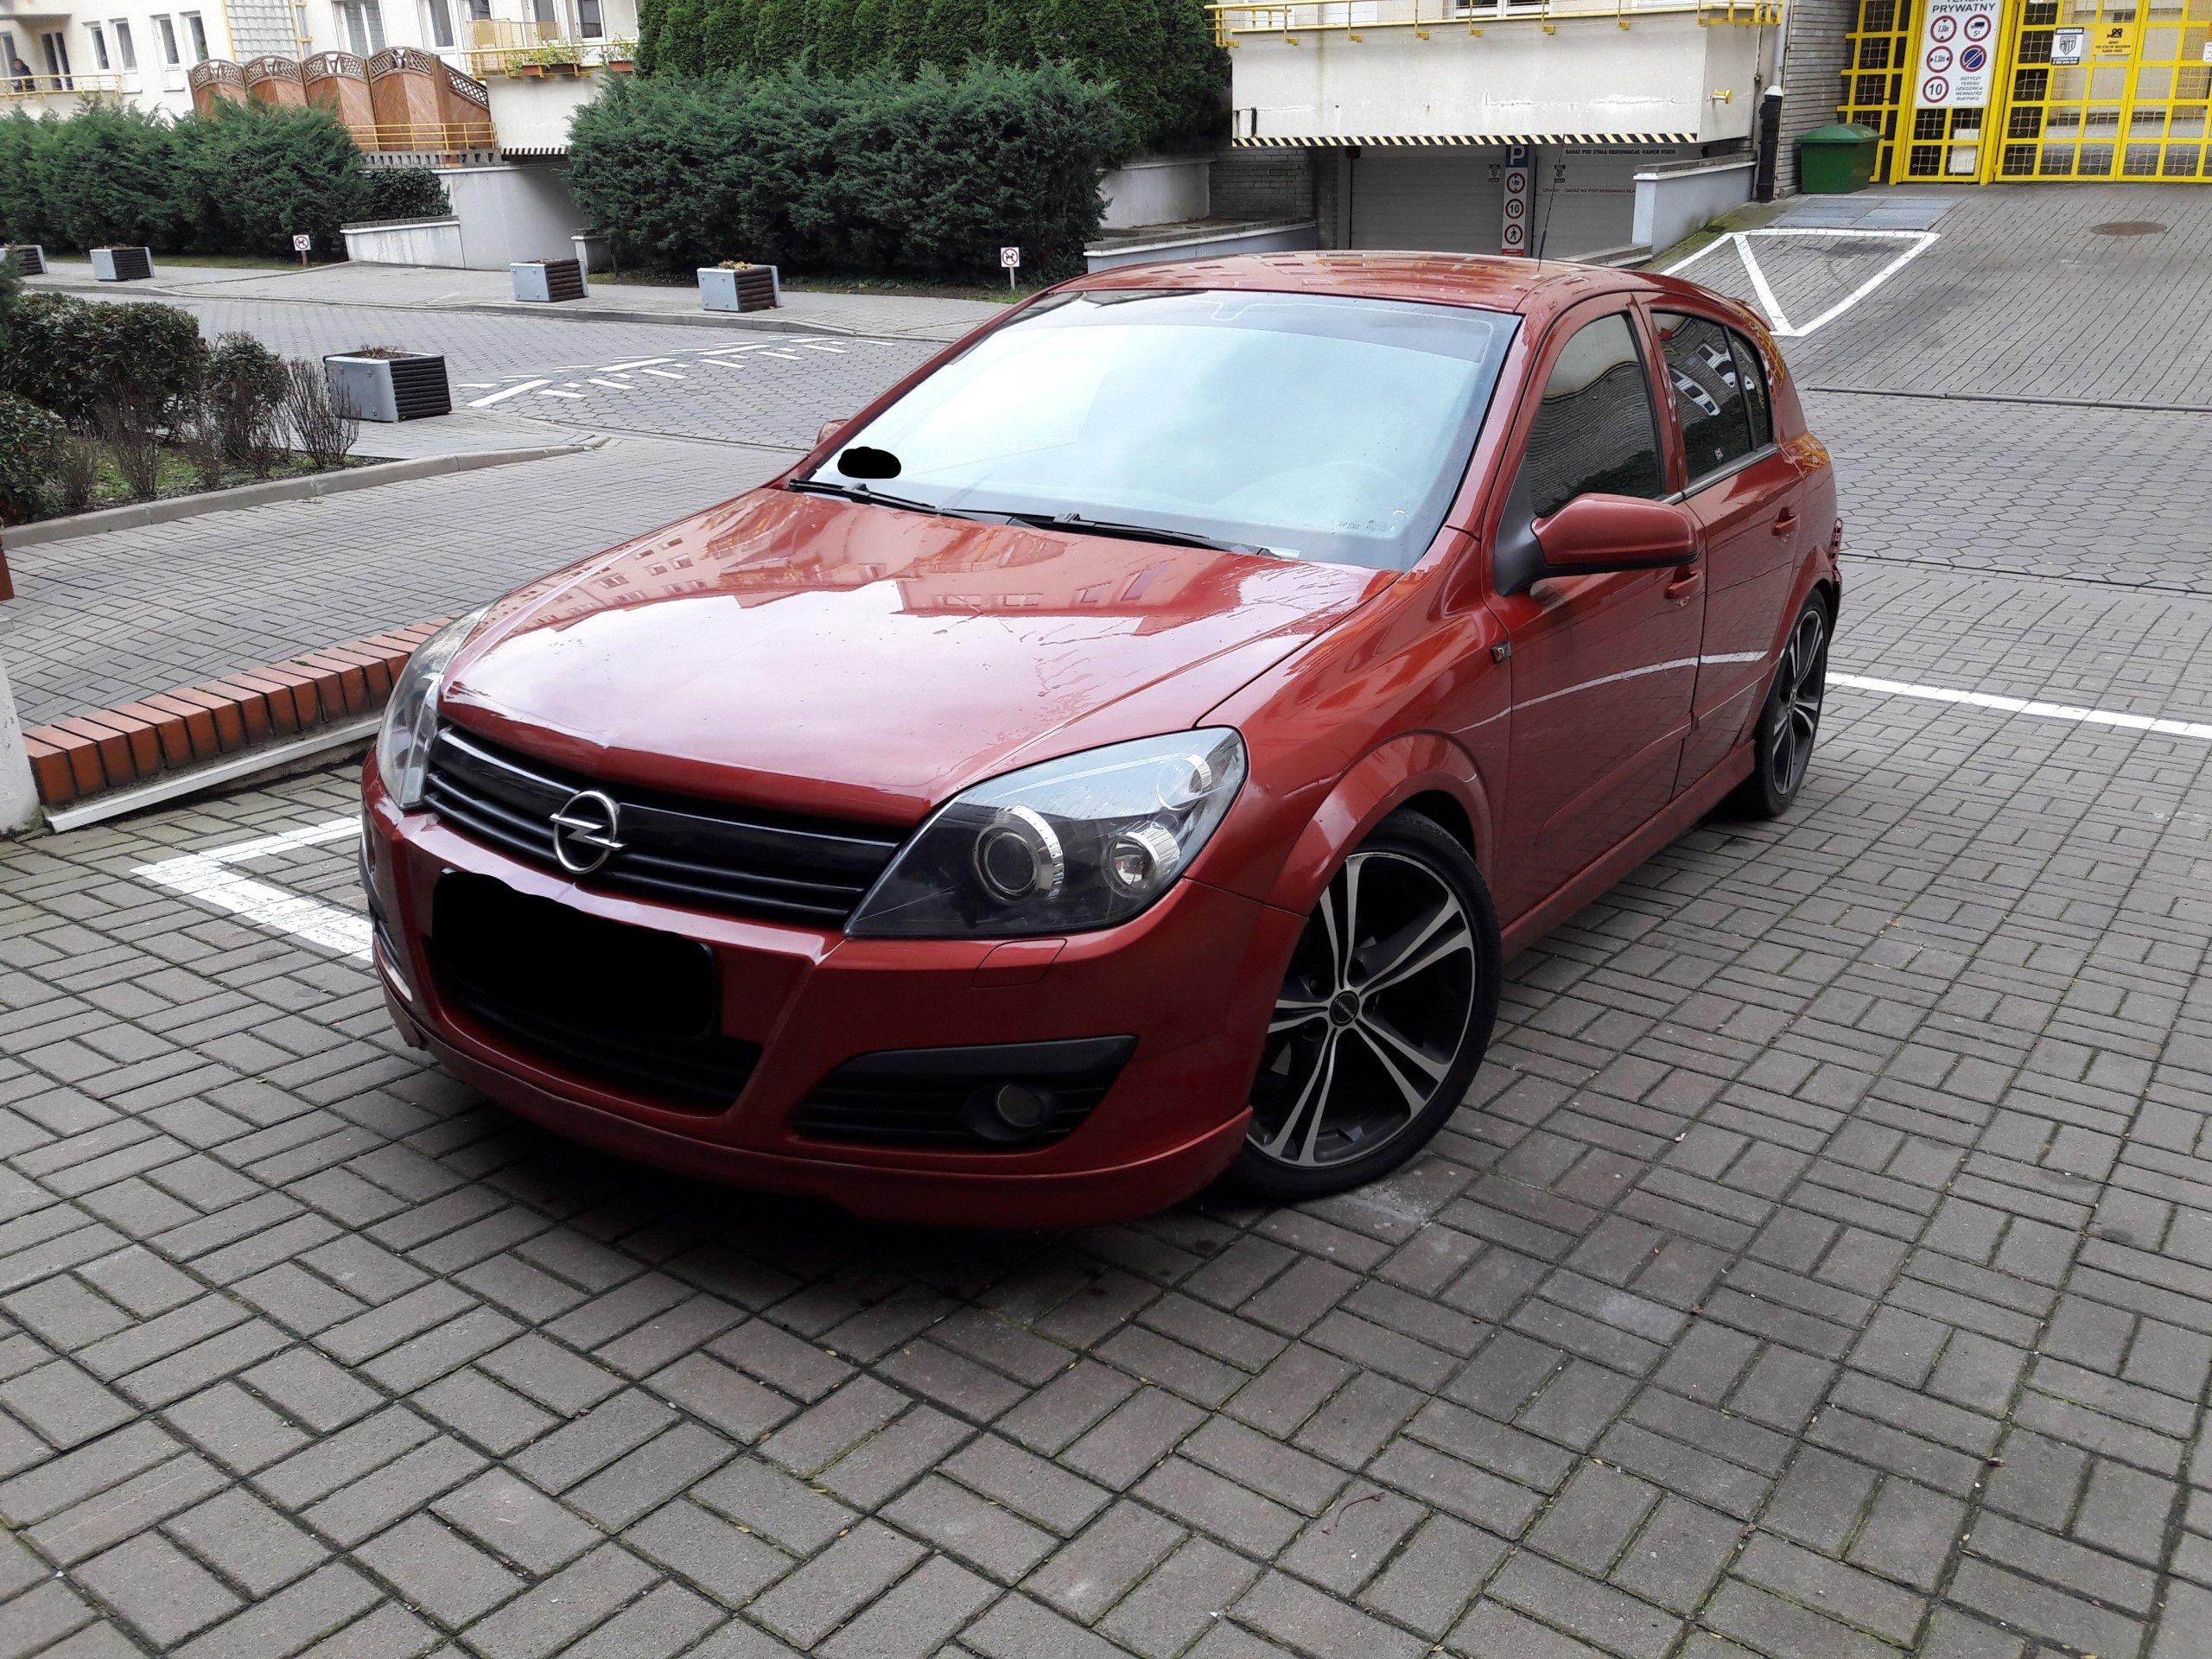 Opel Astra H Opc Line 1 6 Benzyna Lpg Klima Xenon 7043123756 Oficjalne Archiwum Allegro